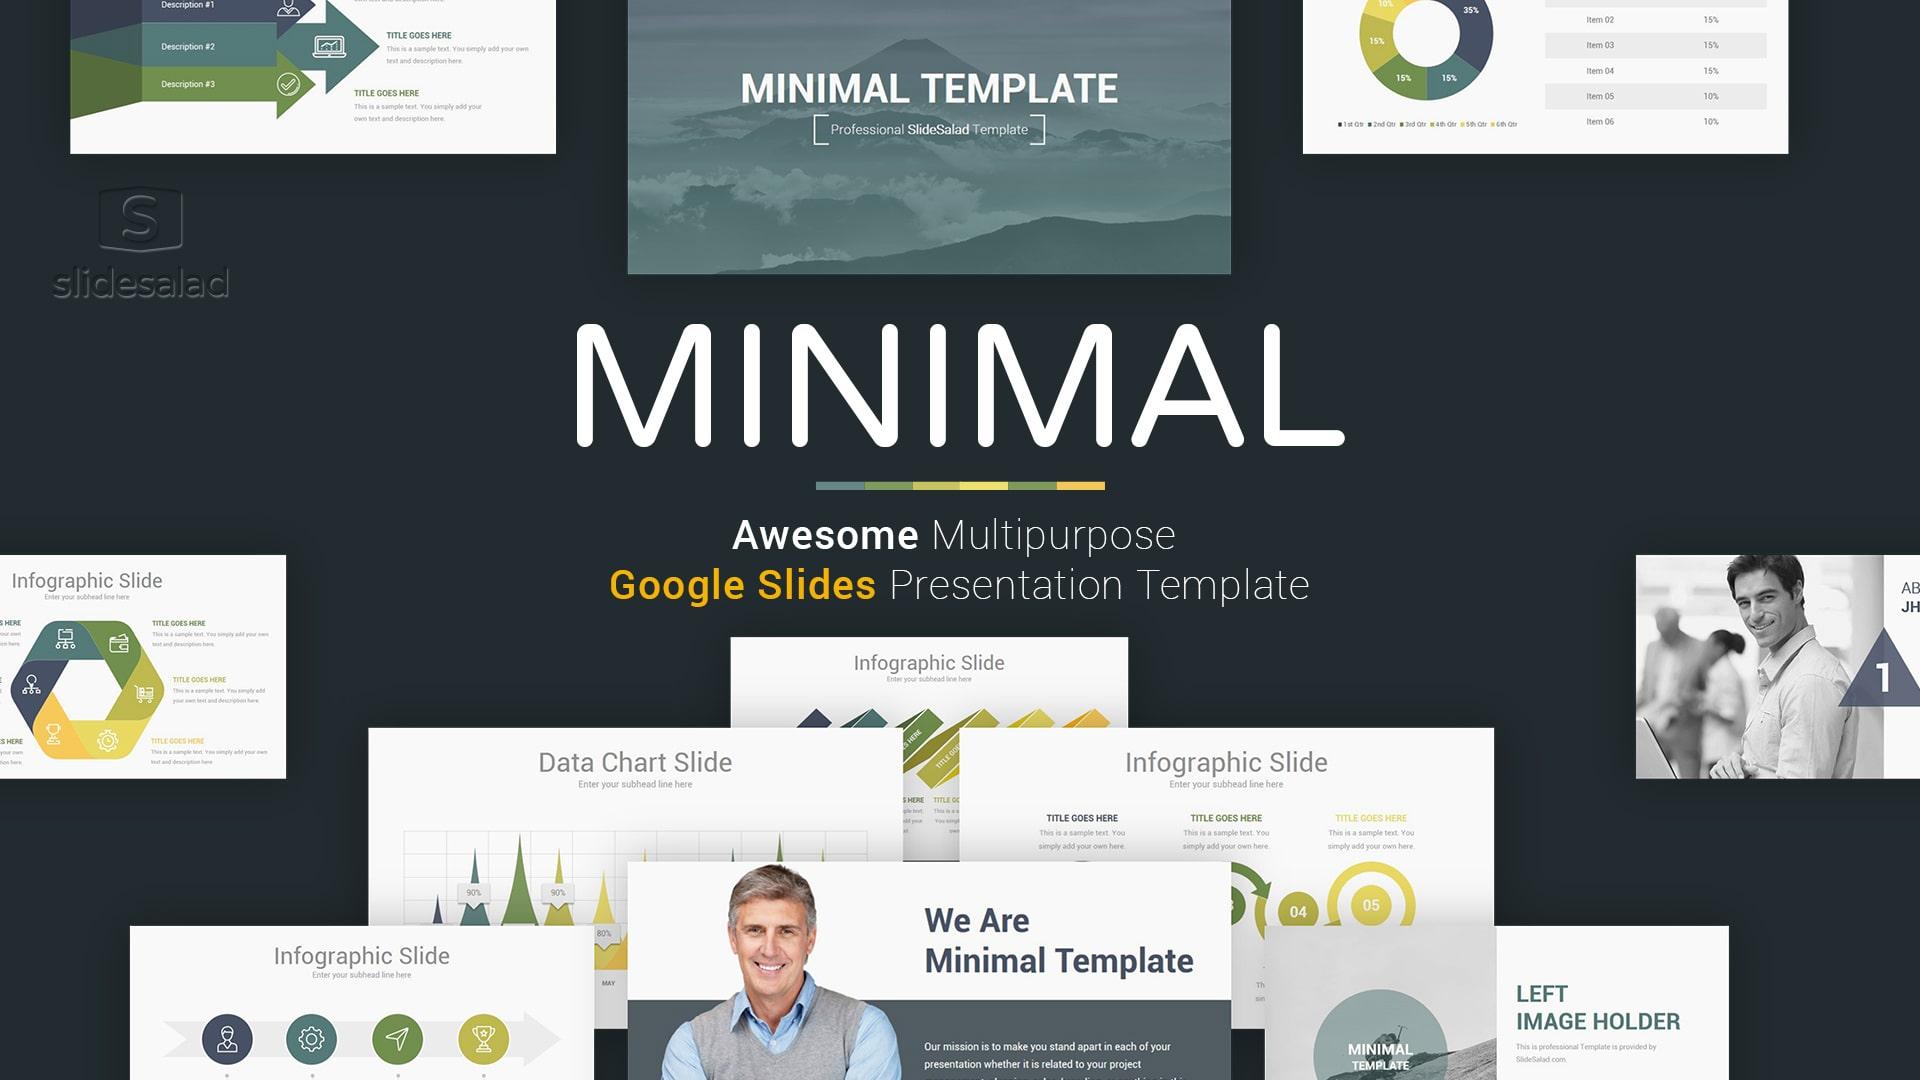 Professional Minimal Google Slides Presentation Template - Corporate Google Slides Theme